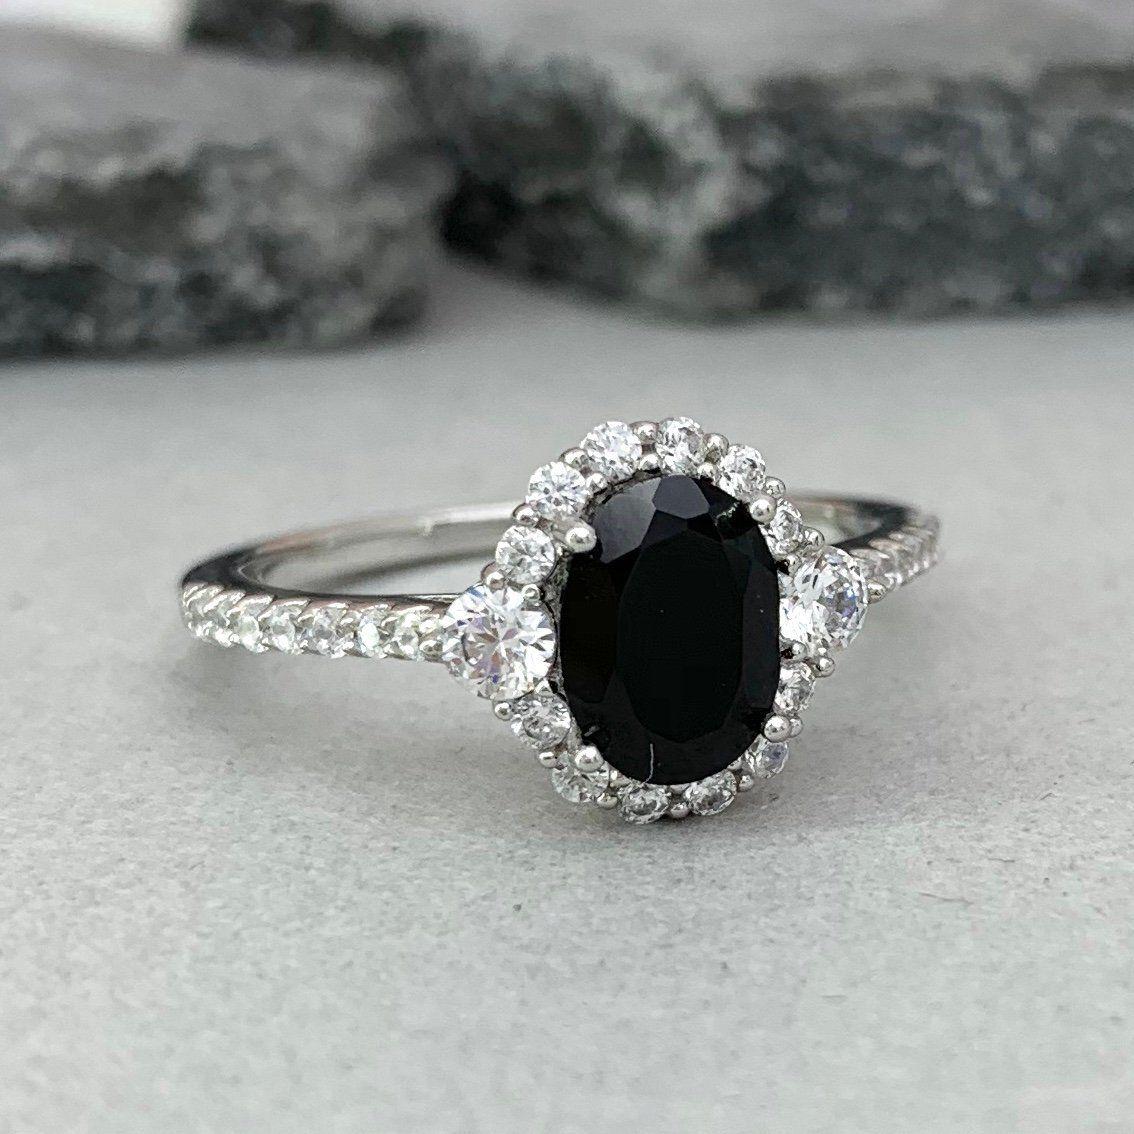 Rose Gold Black Onyx Wedding Ring 925 Silver Black Onyx Engagement Ring For Women Anniversary Ring Silver Black Onyx Art Deco Antique Ring